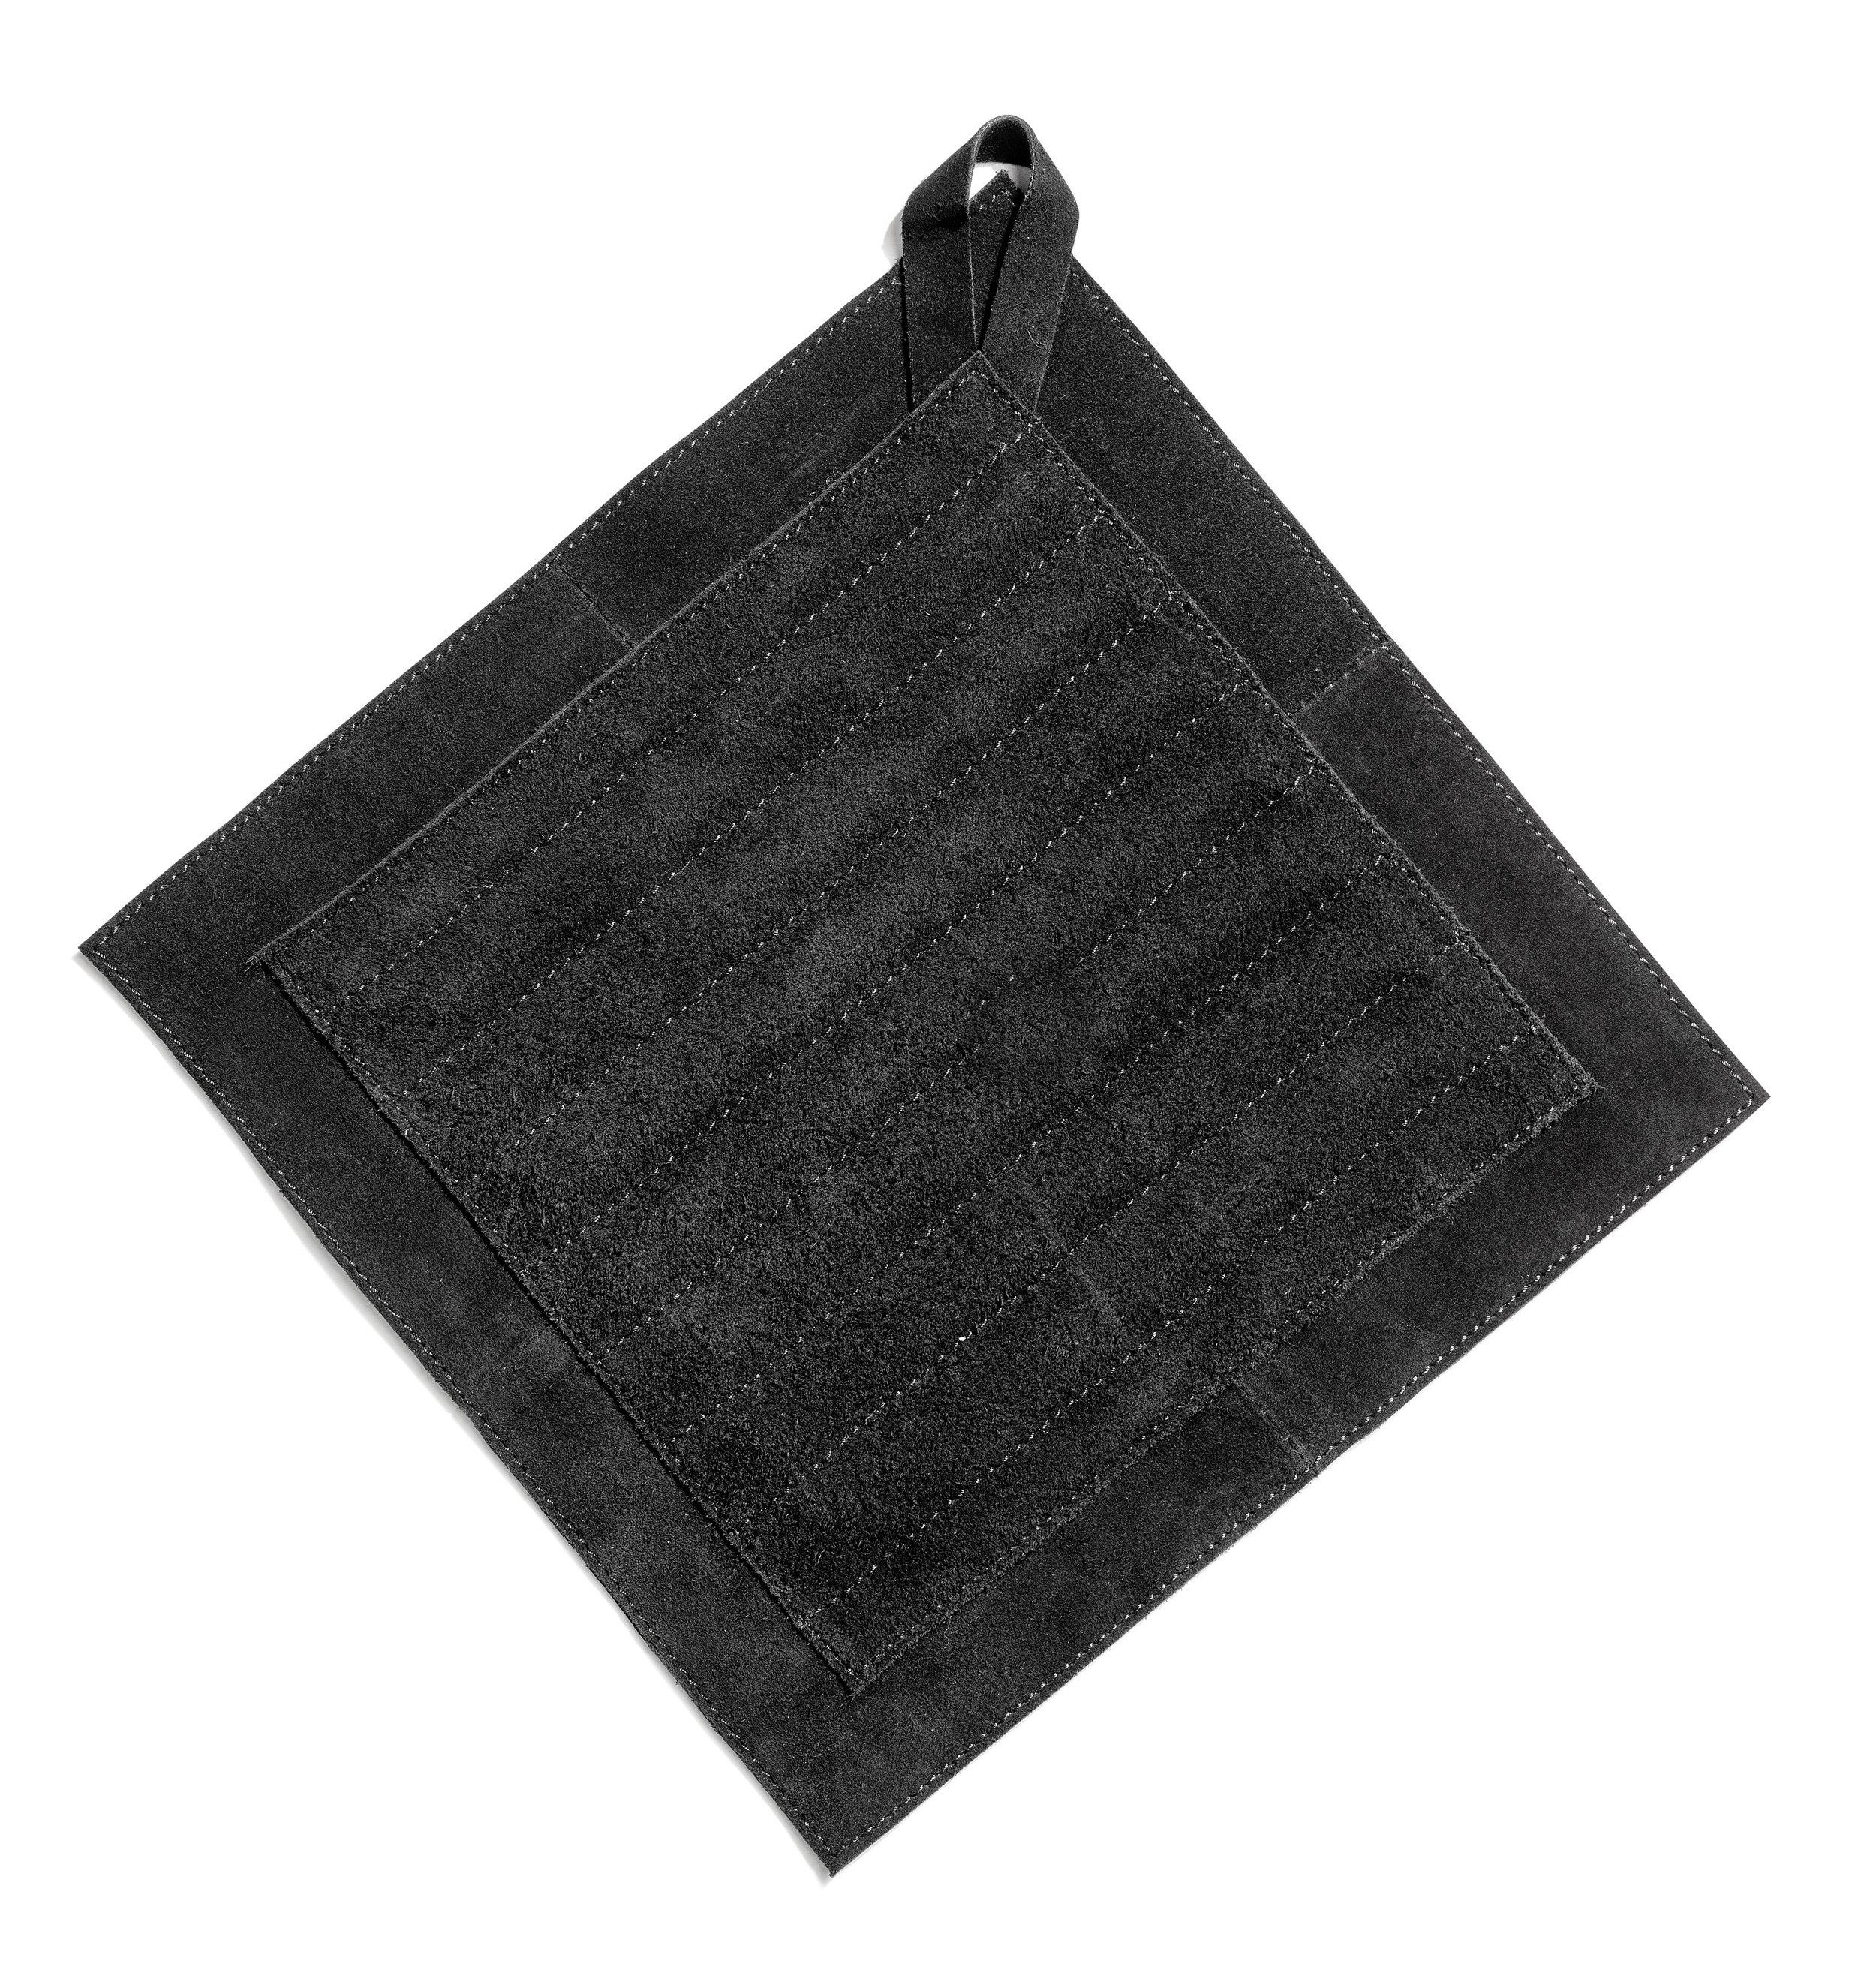 Trinity pot holder black suede 28x28